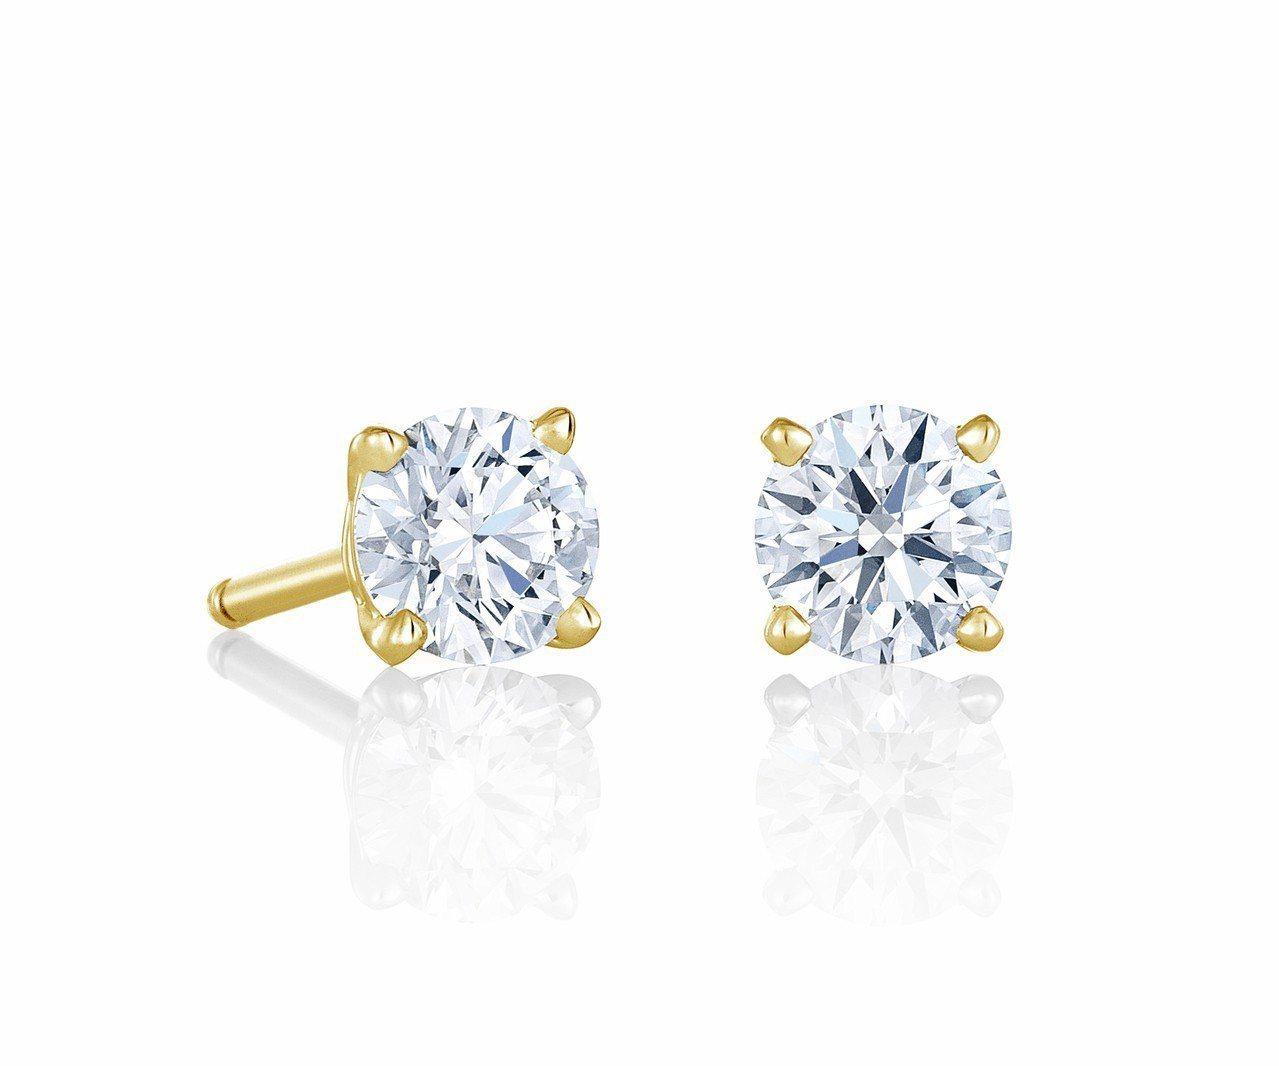 DB Classic 18K黃金單鑽耳環,主鑽0.30克拉款式,14萬2,000...